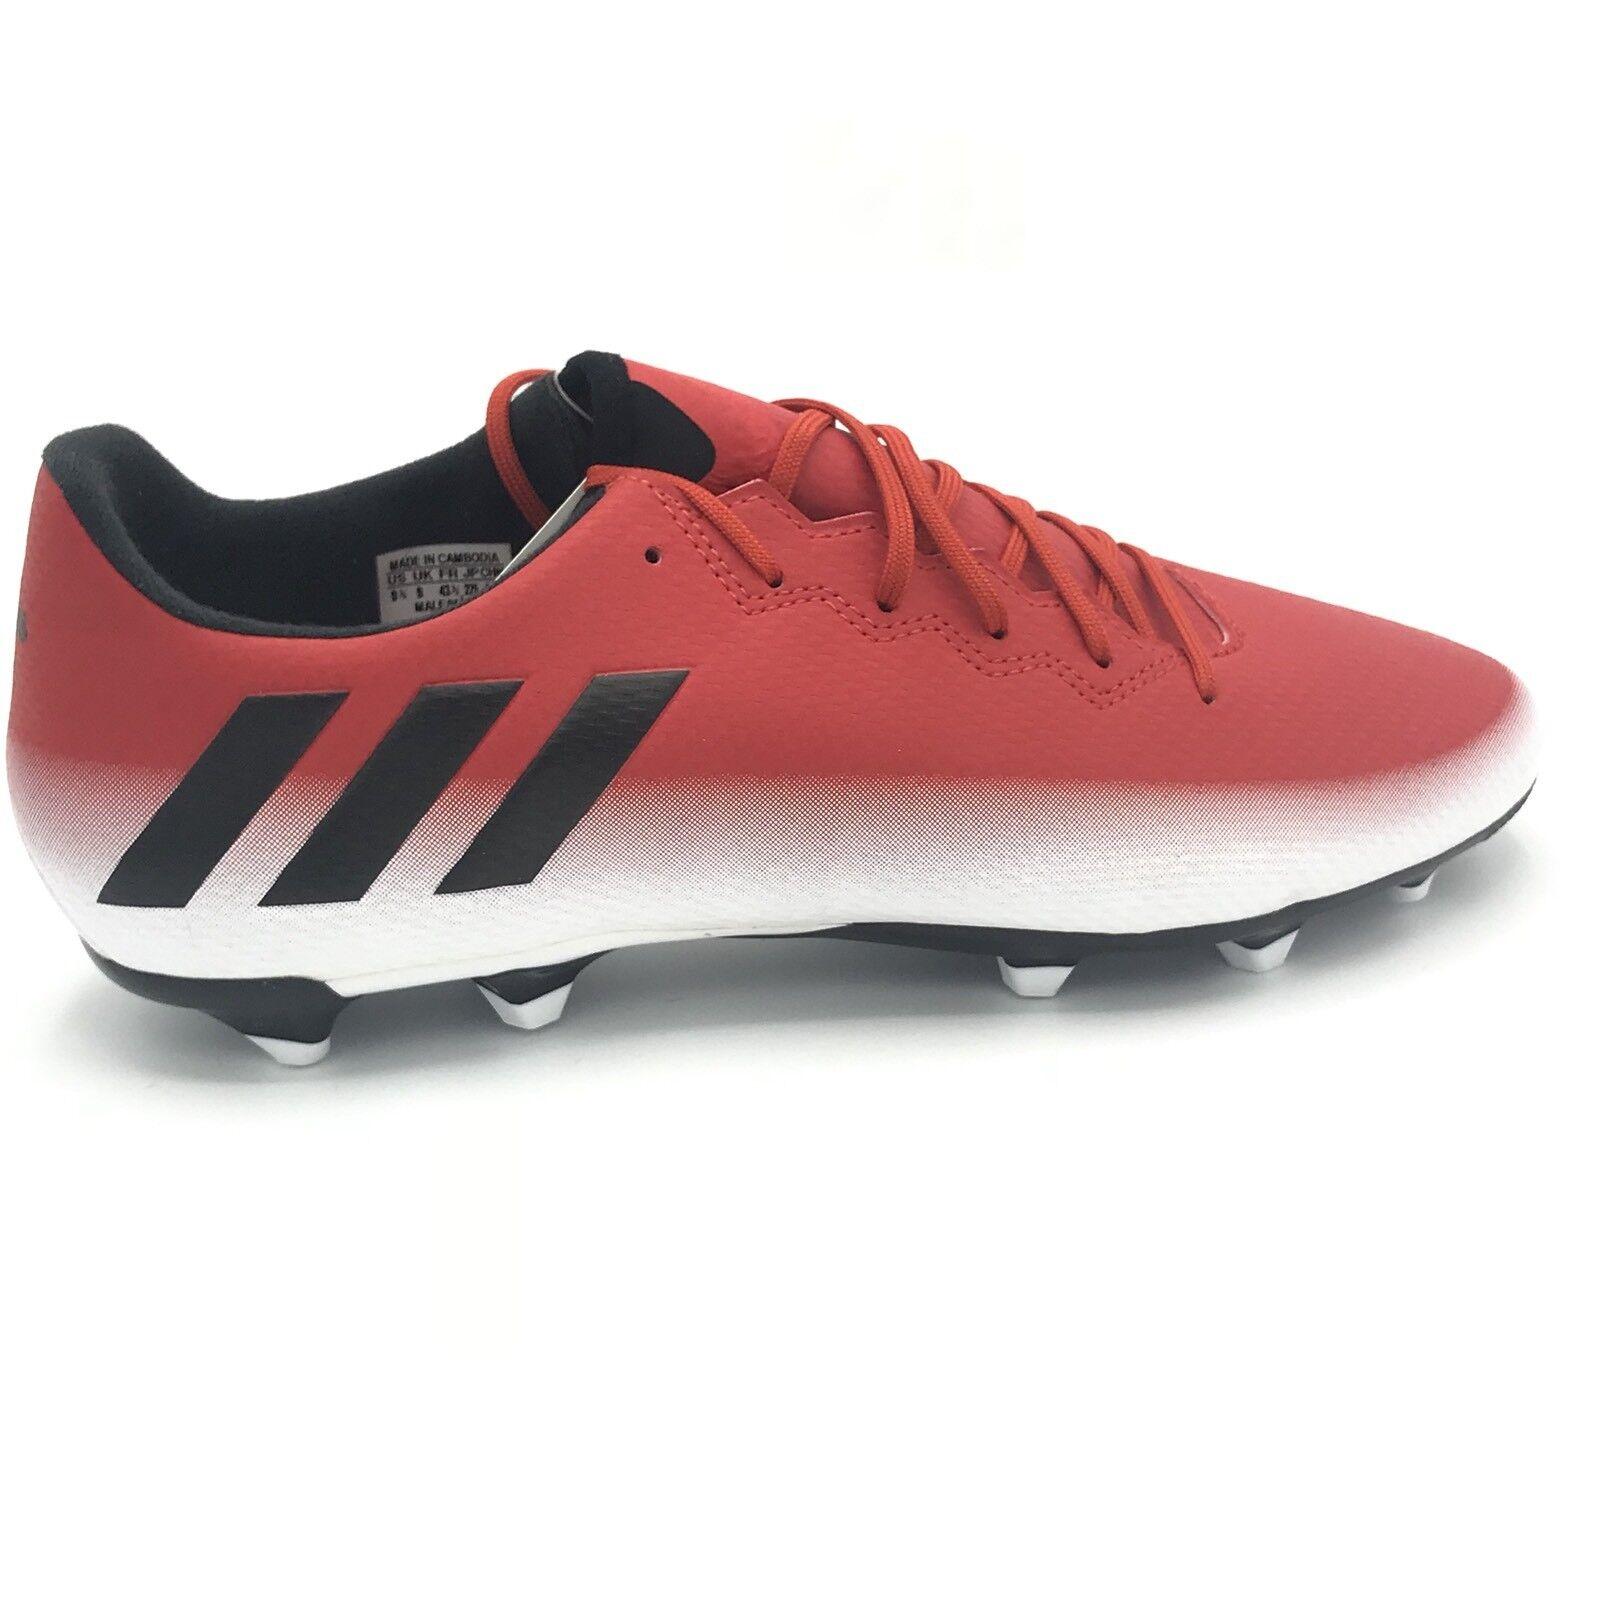 Men Adidas Soccer FG cleats Messi 16.3 FG Soccer Shoe BA9020 b0a04c